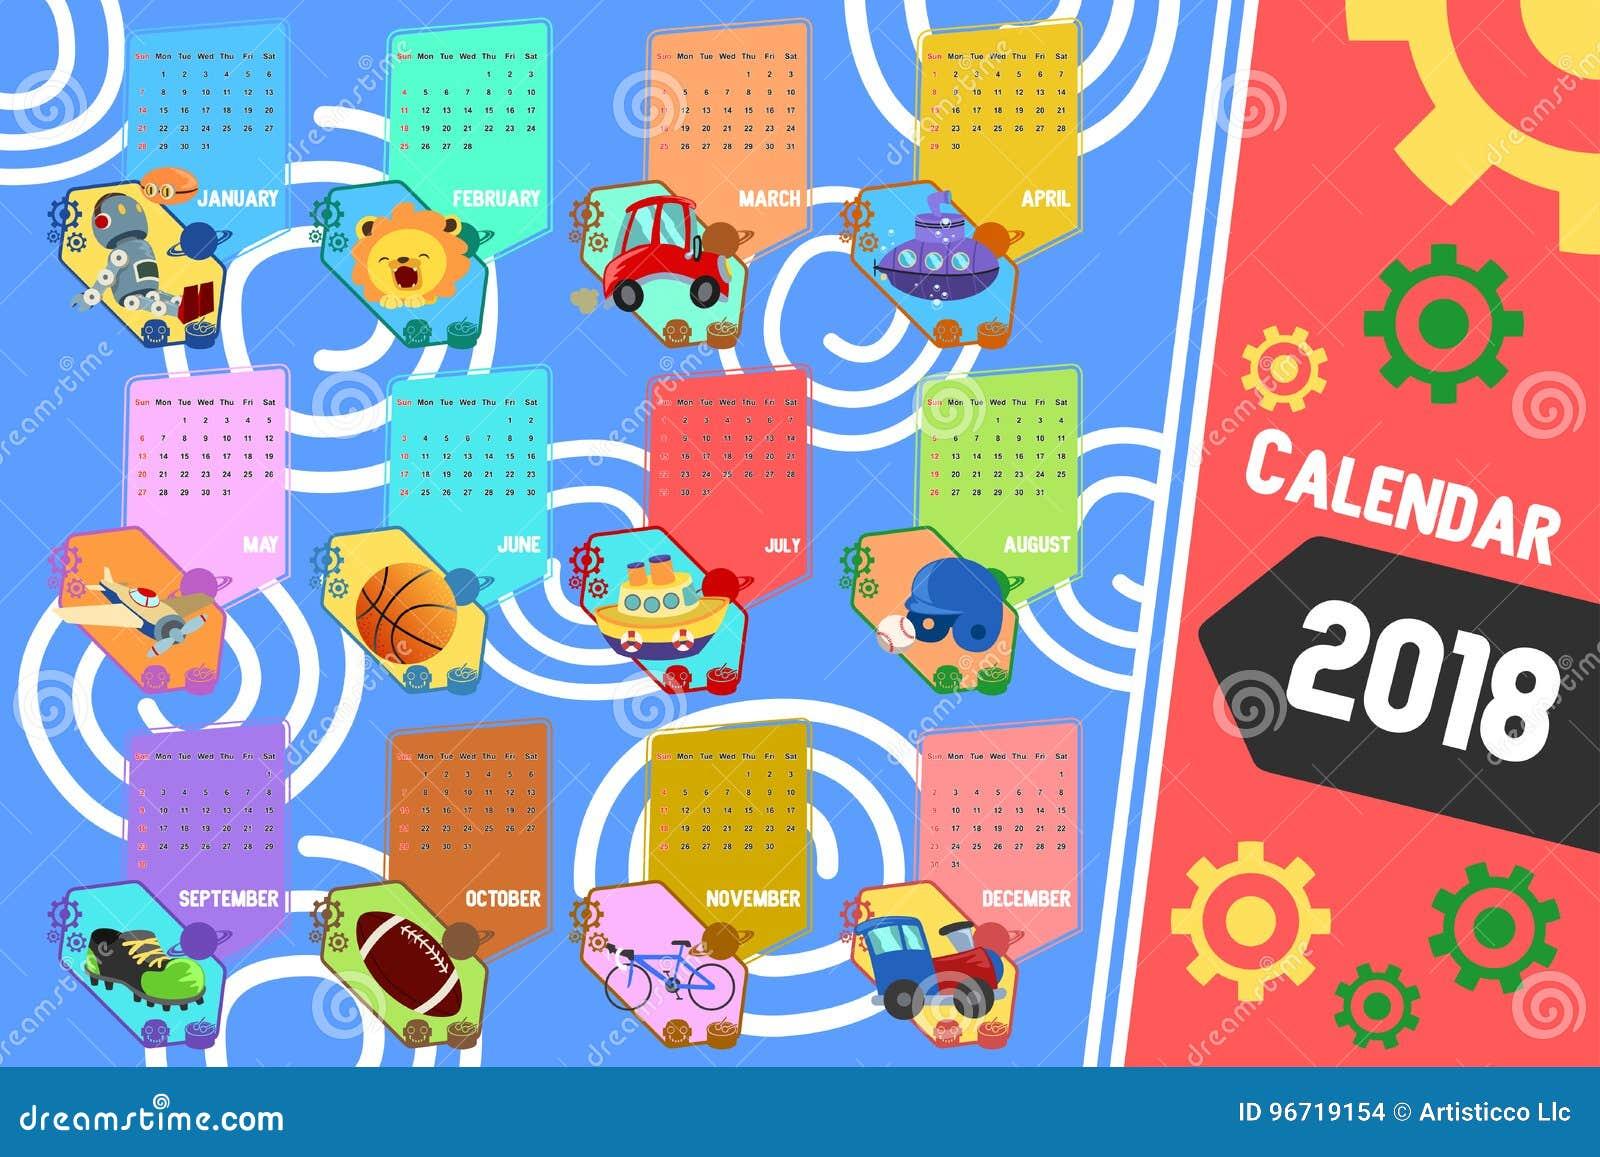 Calendario 2018 en estilo de la historieta